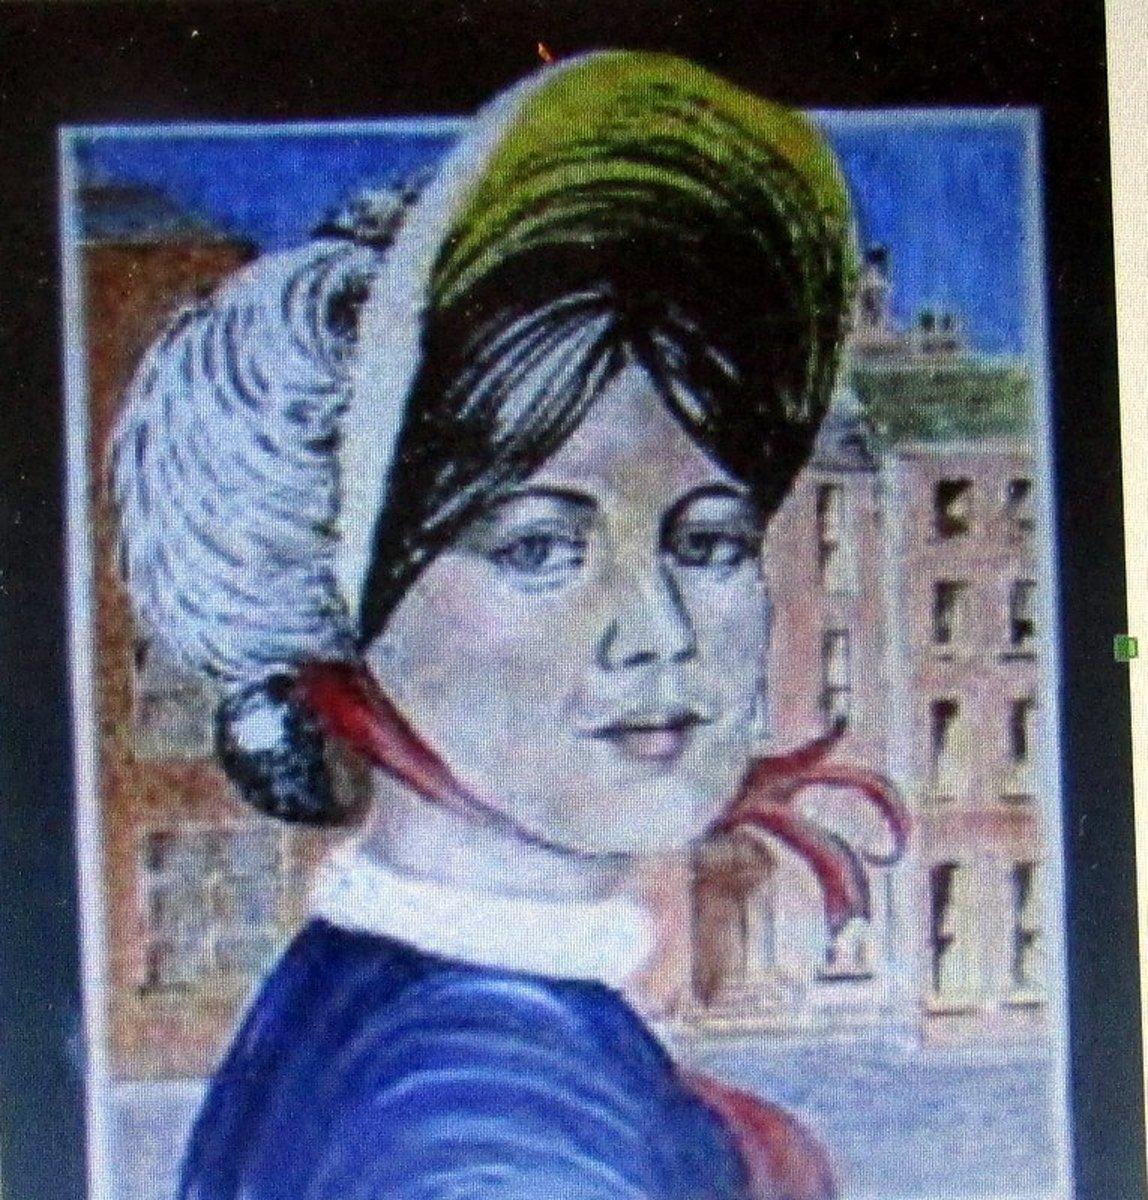 Prisoner Margaret Aylward was an Irish Nun